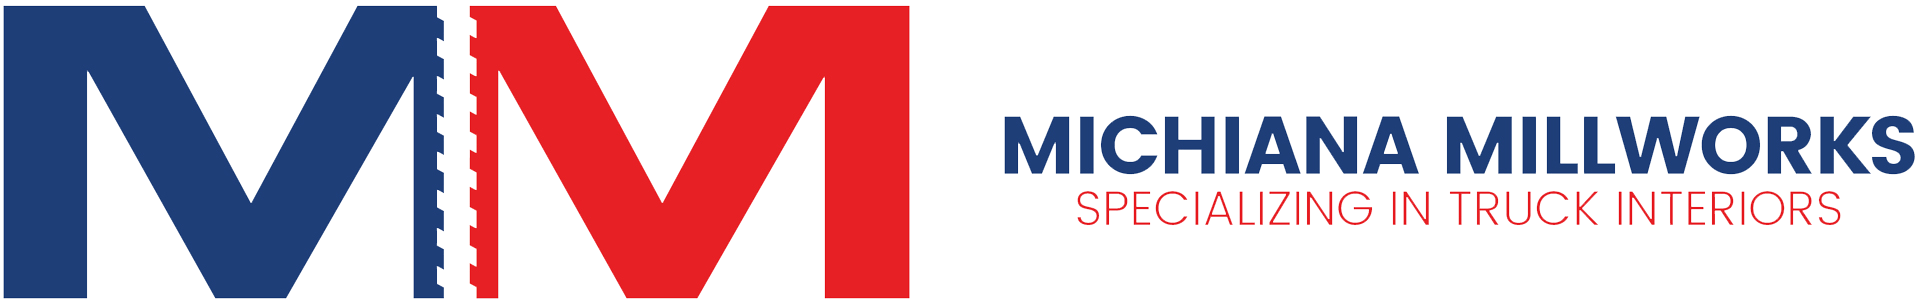 Michiana Millworks